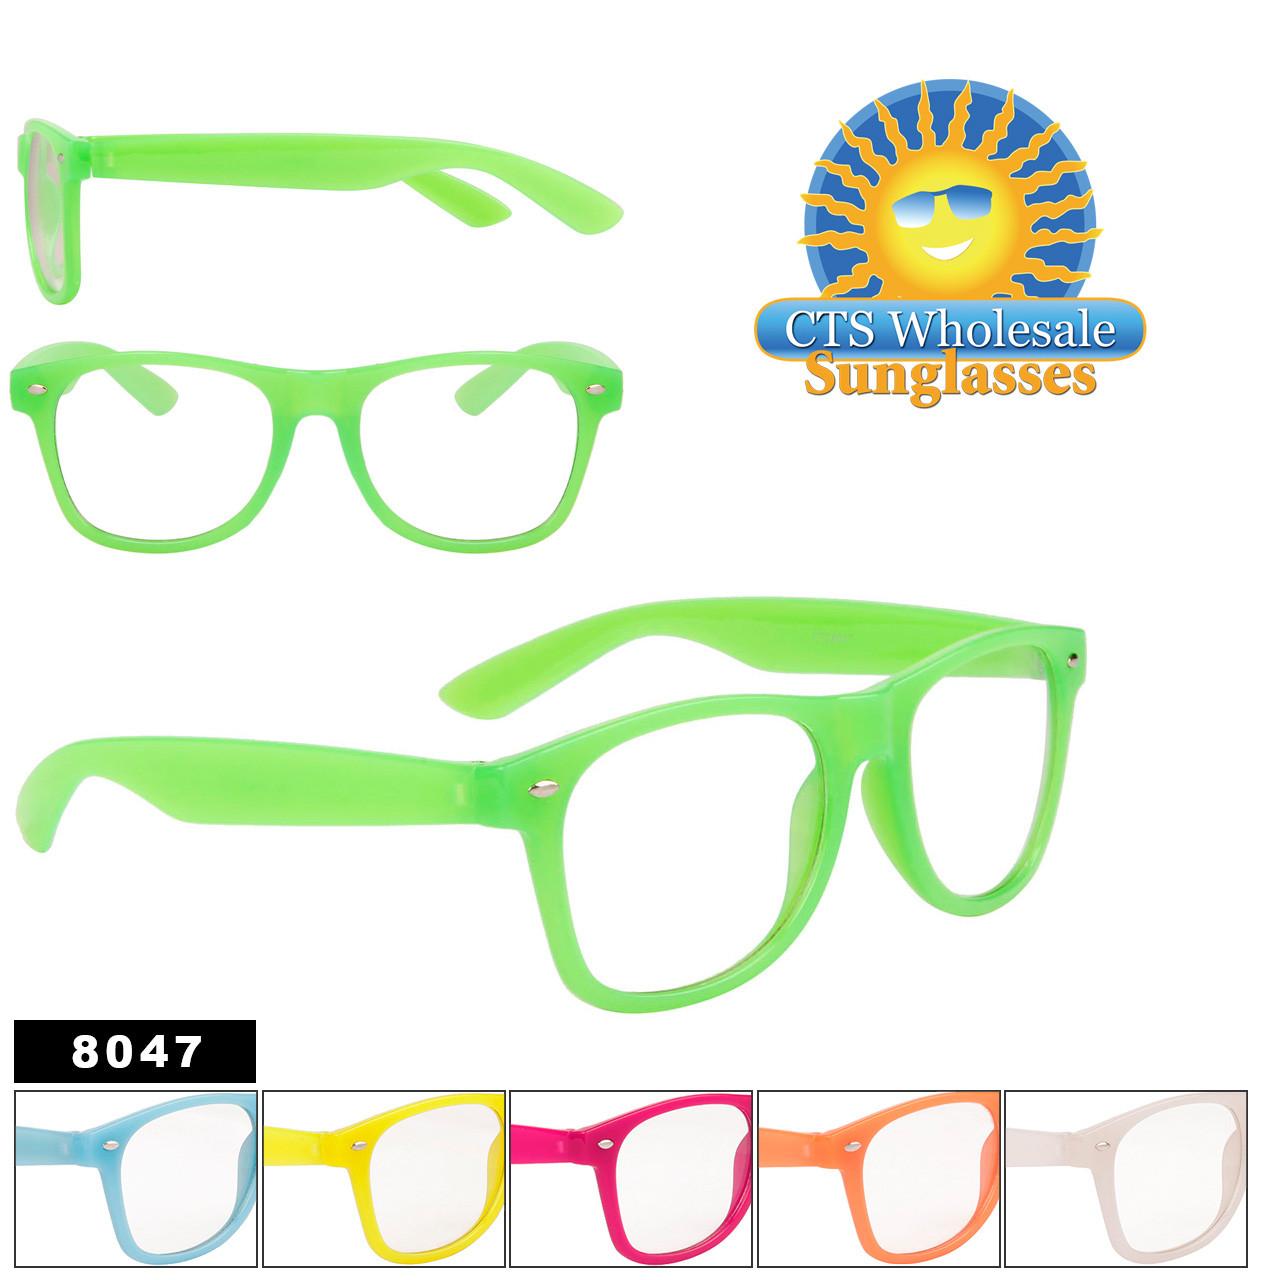 Glow In The Dark Sunglasses - California Classics Style - #8047